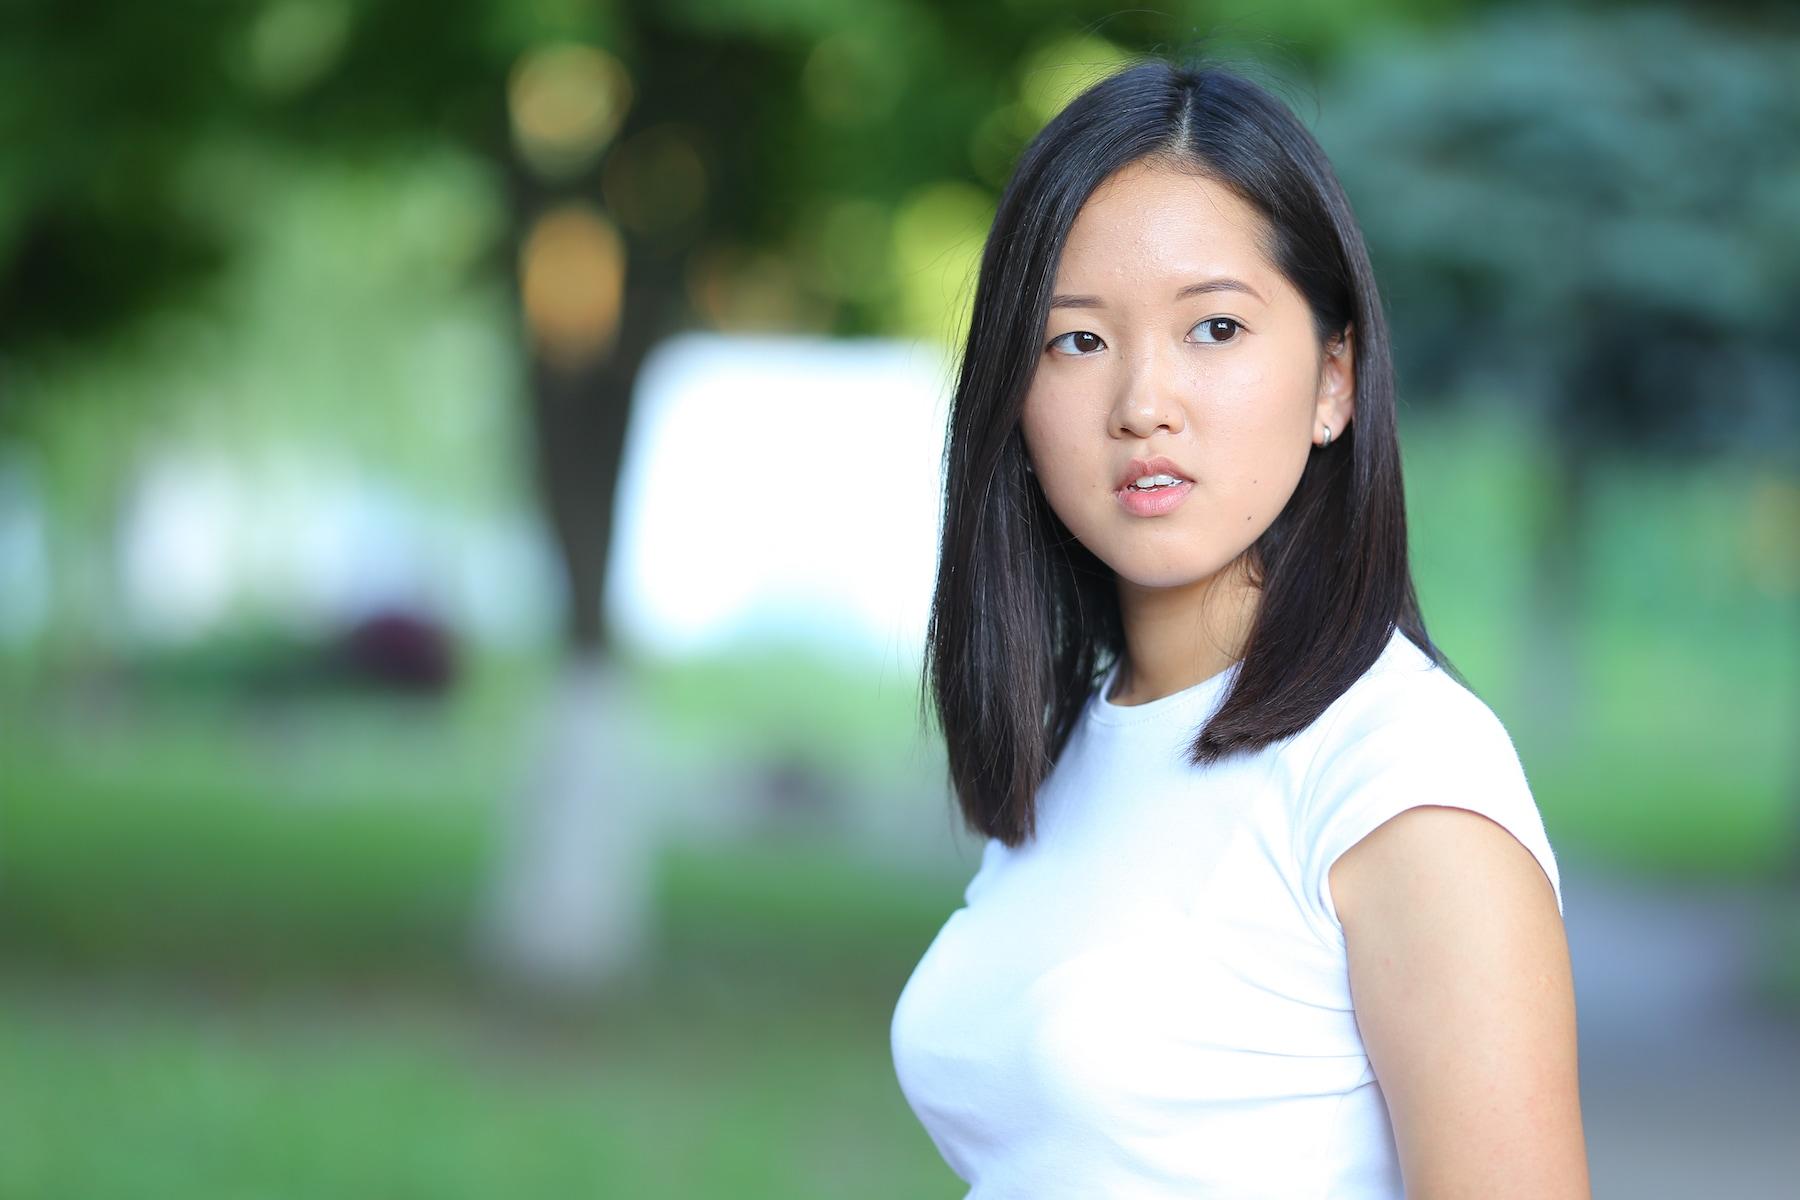 Wanita asia dengan model rambut sebahu untuk wajah bulat soft layer